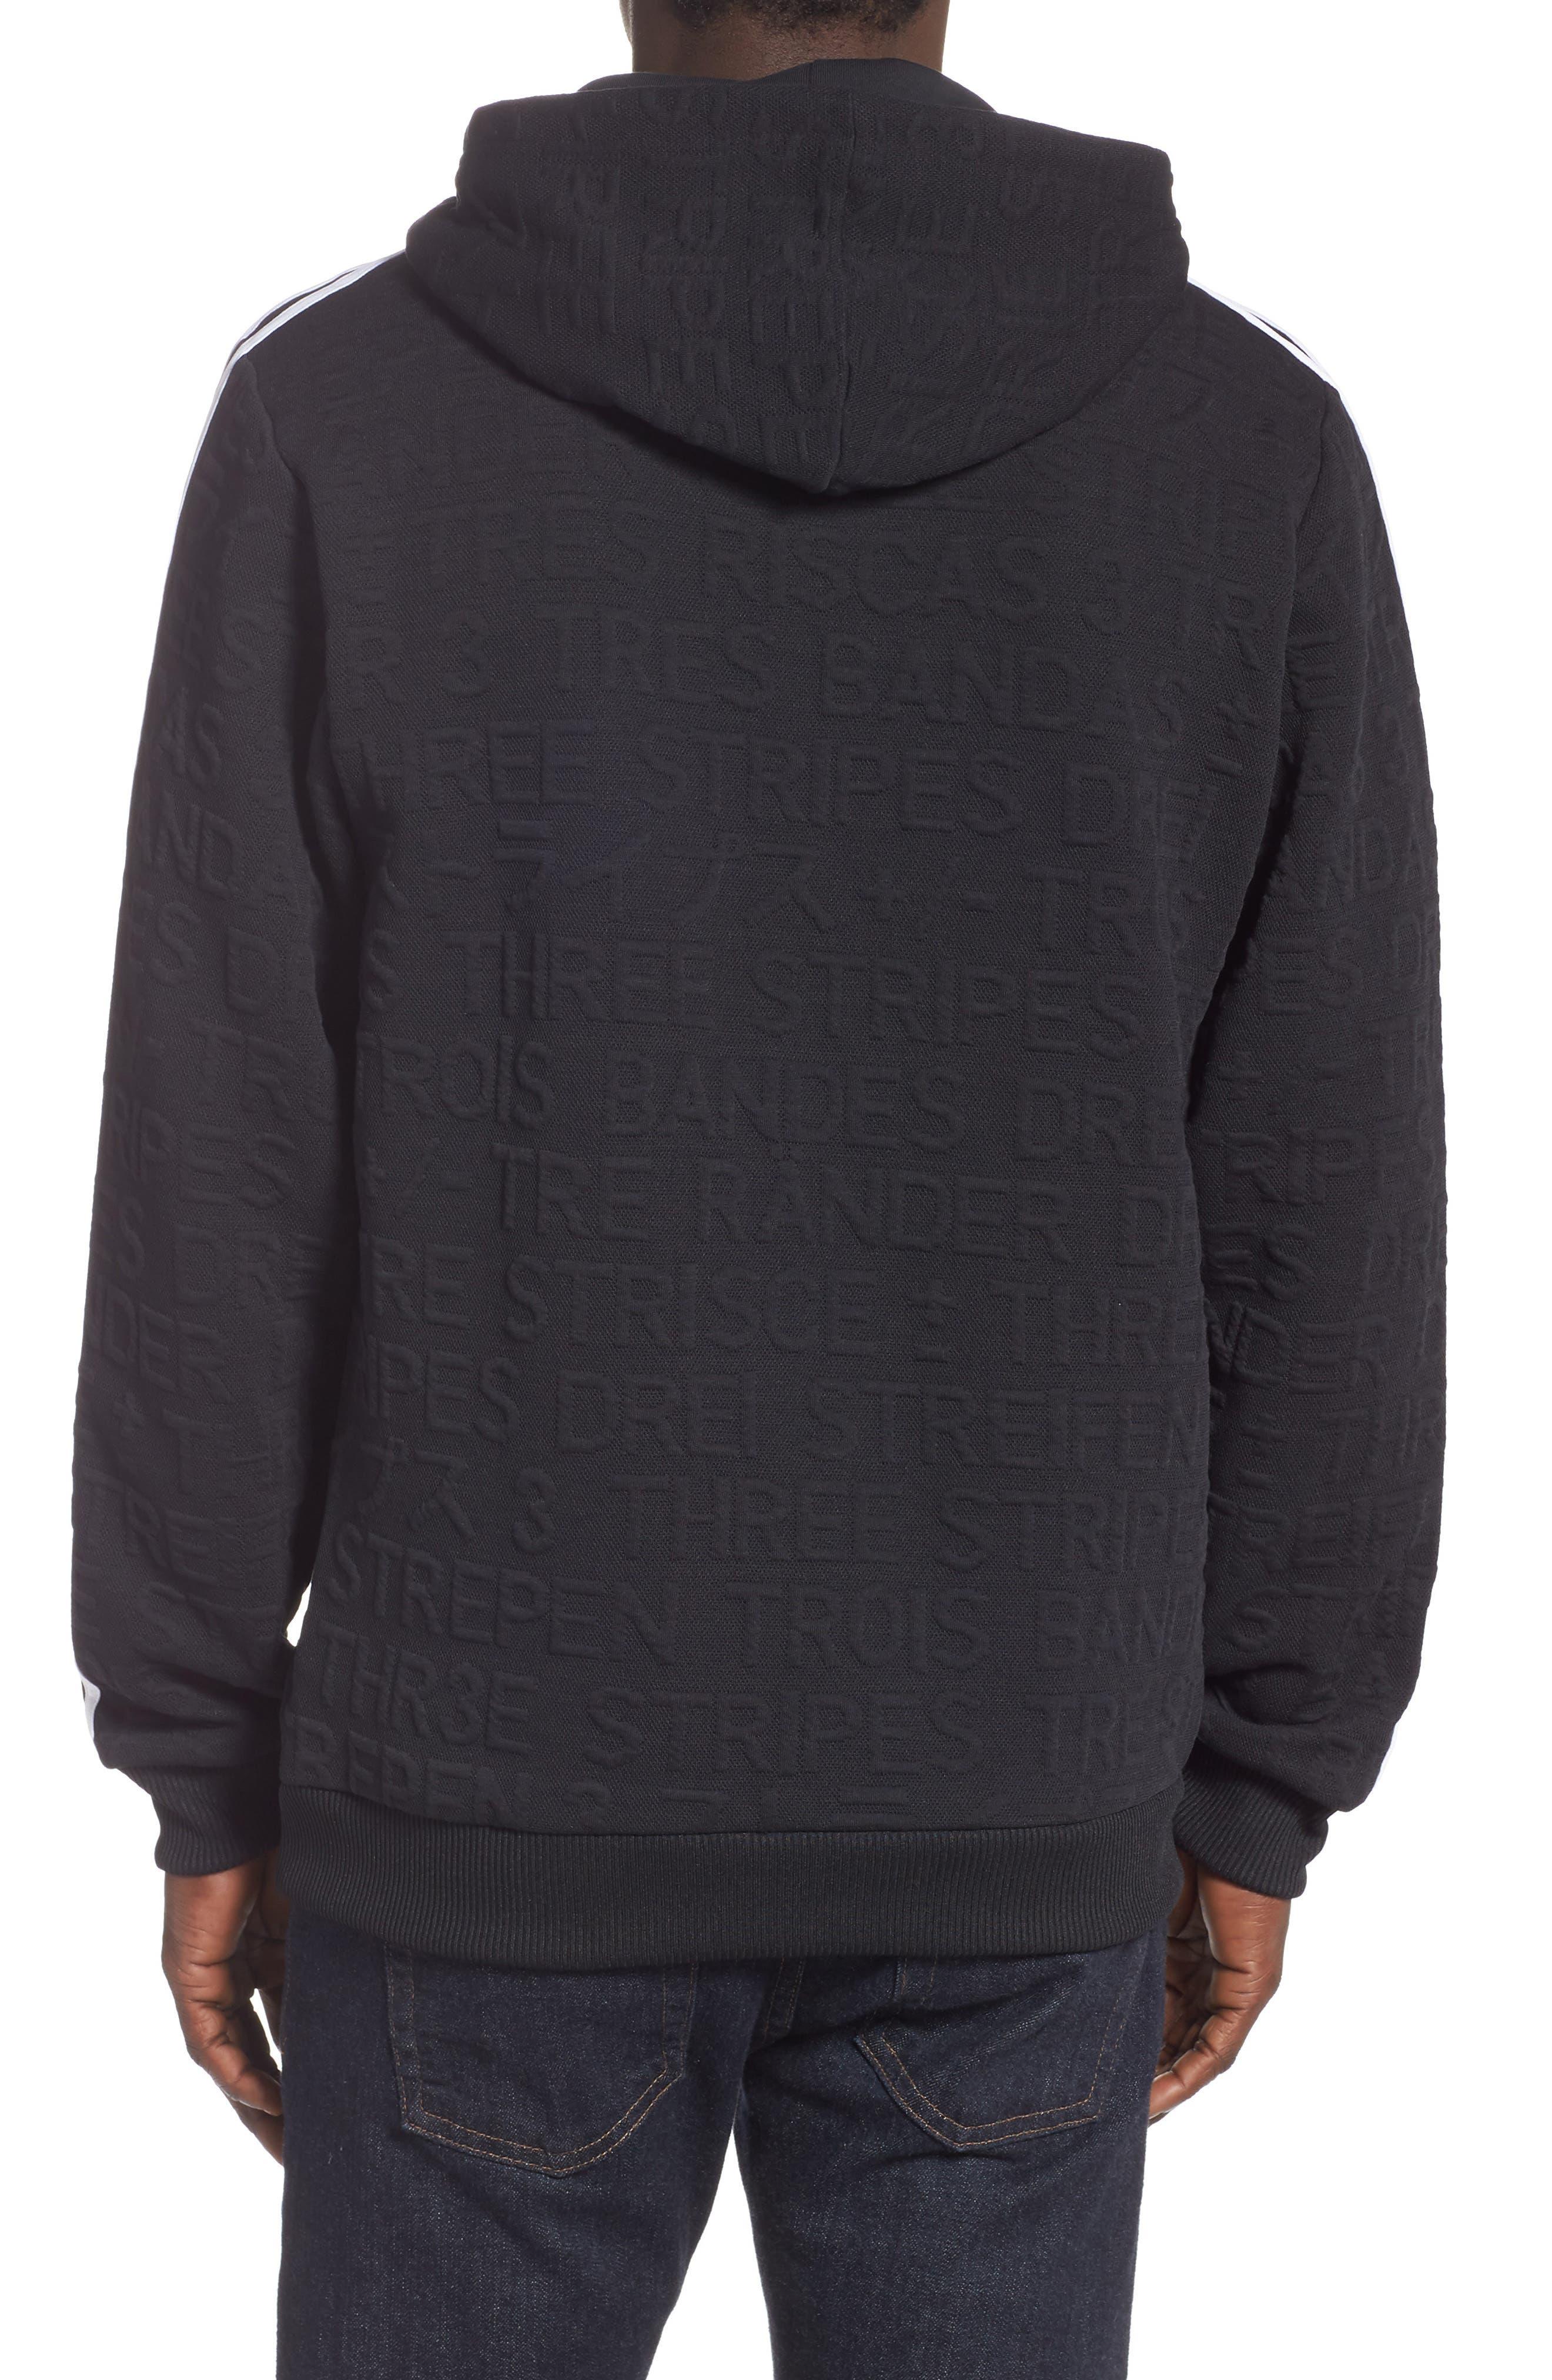 ADIDAS,                             3-Stripes Hoodie Sweatshirt,                             Alternate thumbnail 2, color,                             BLACK